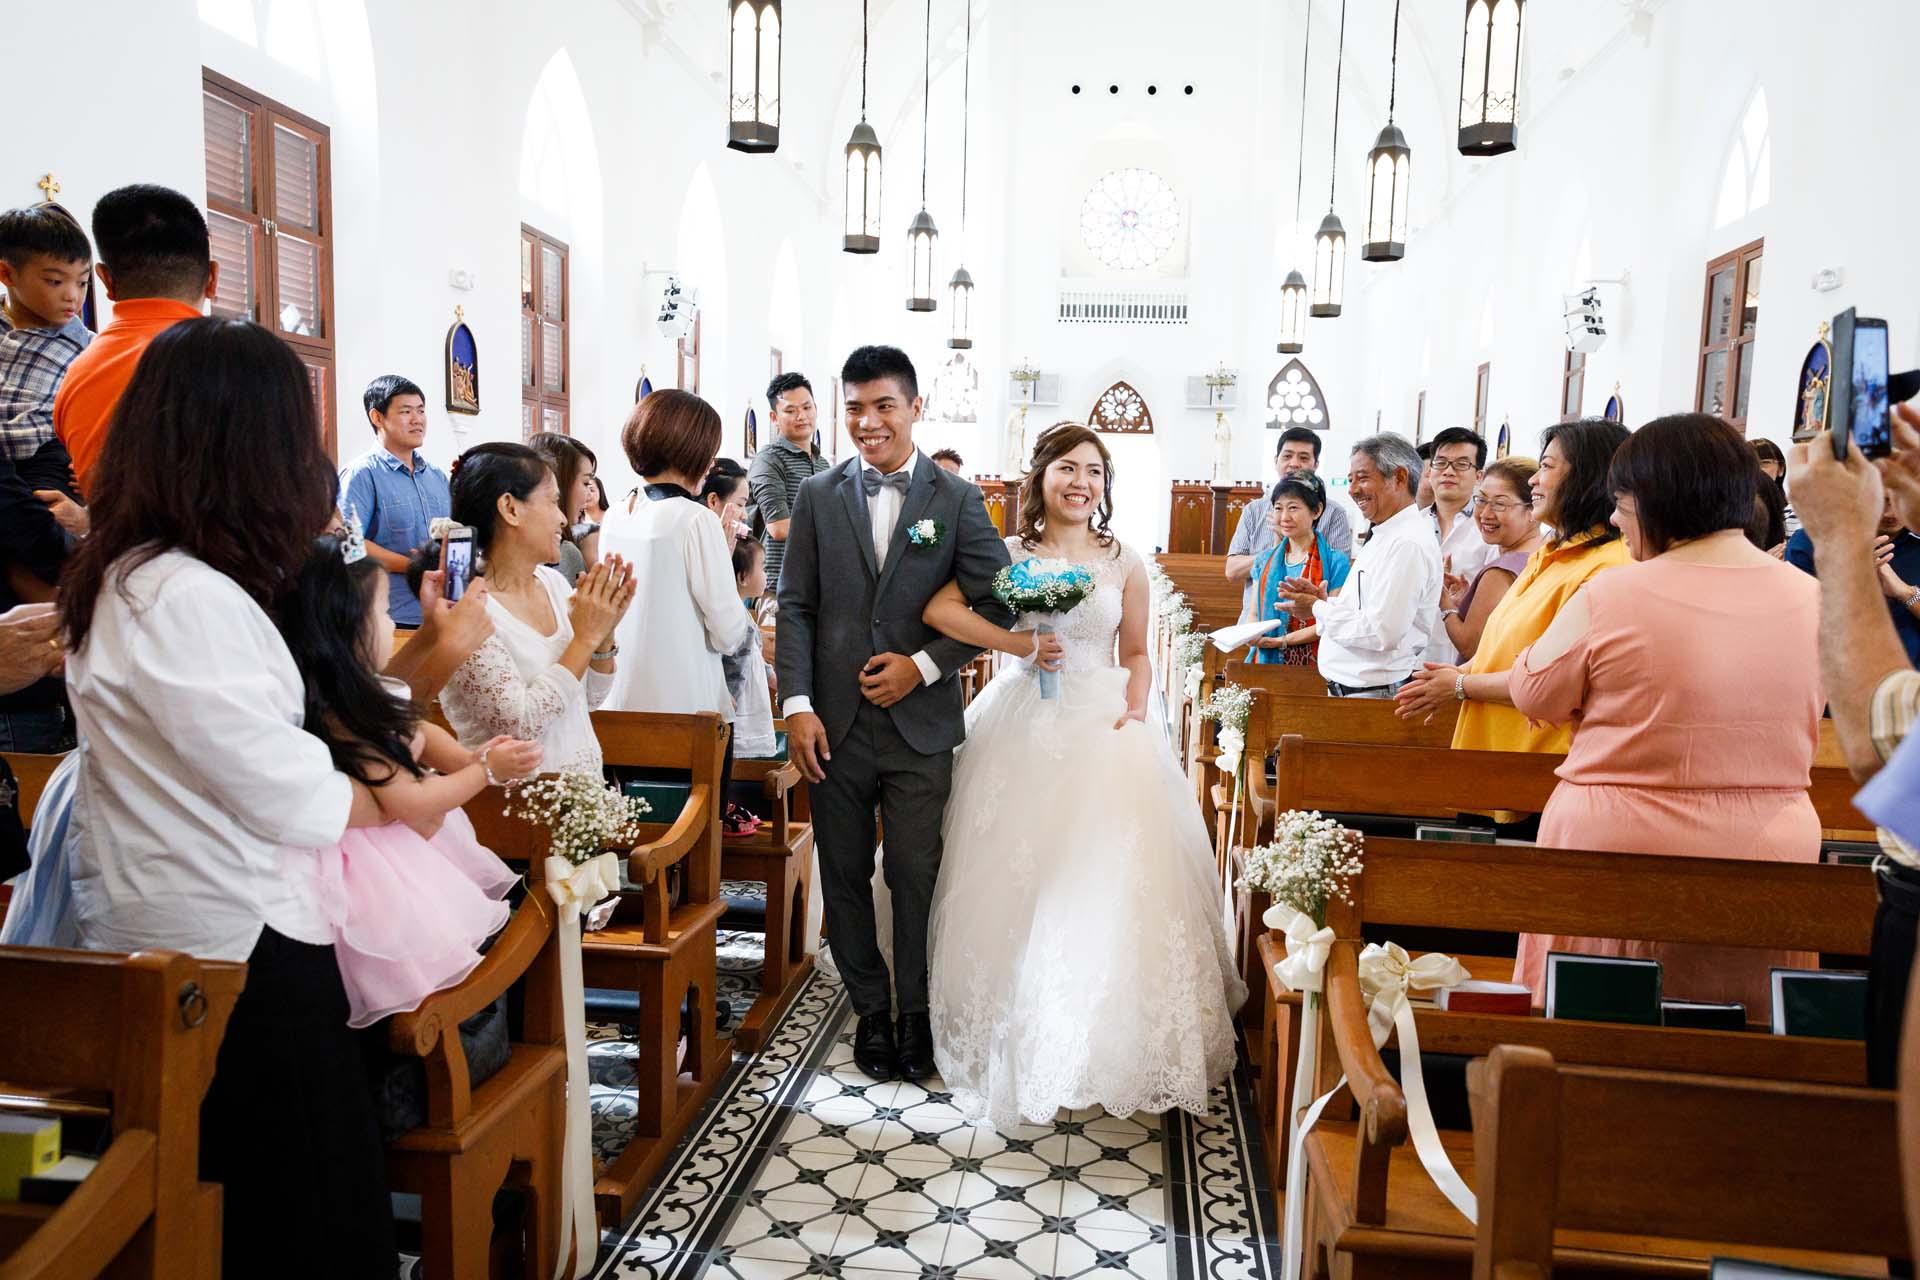 The couple entering the church.